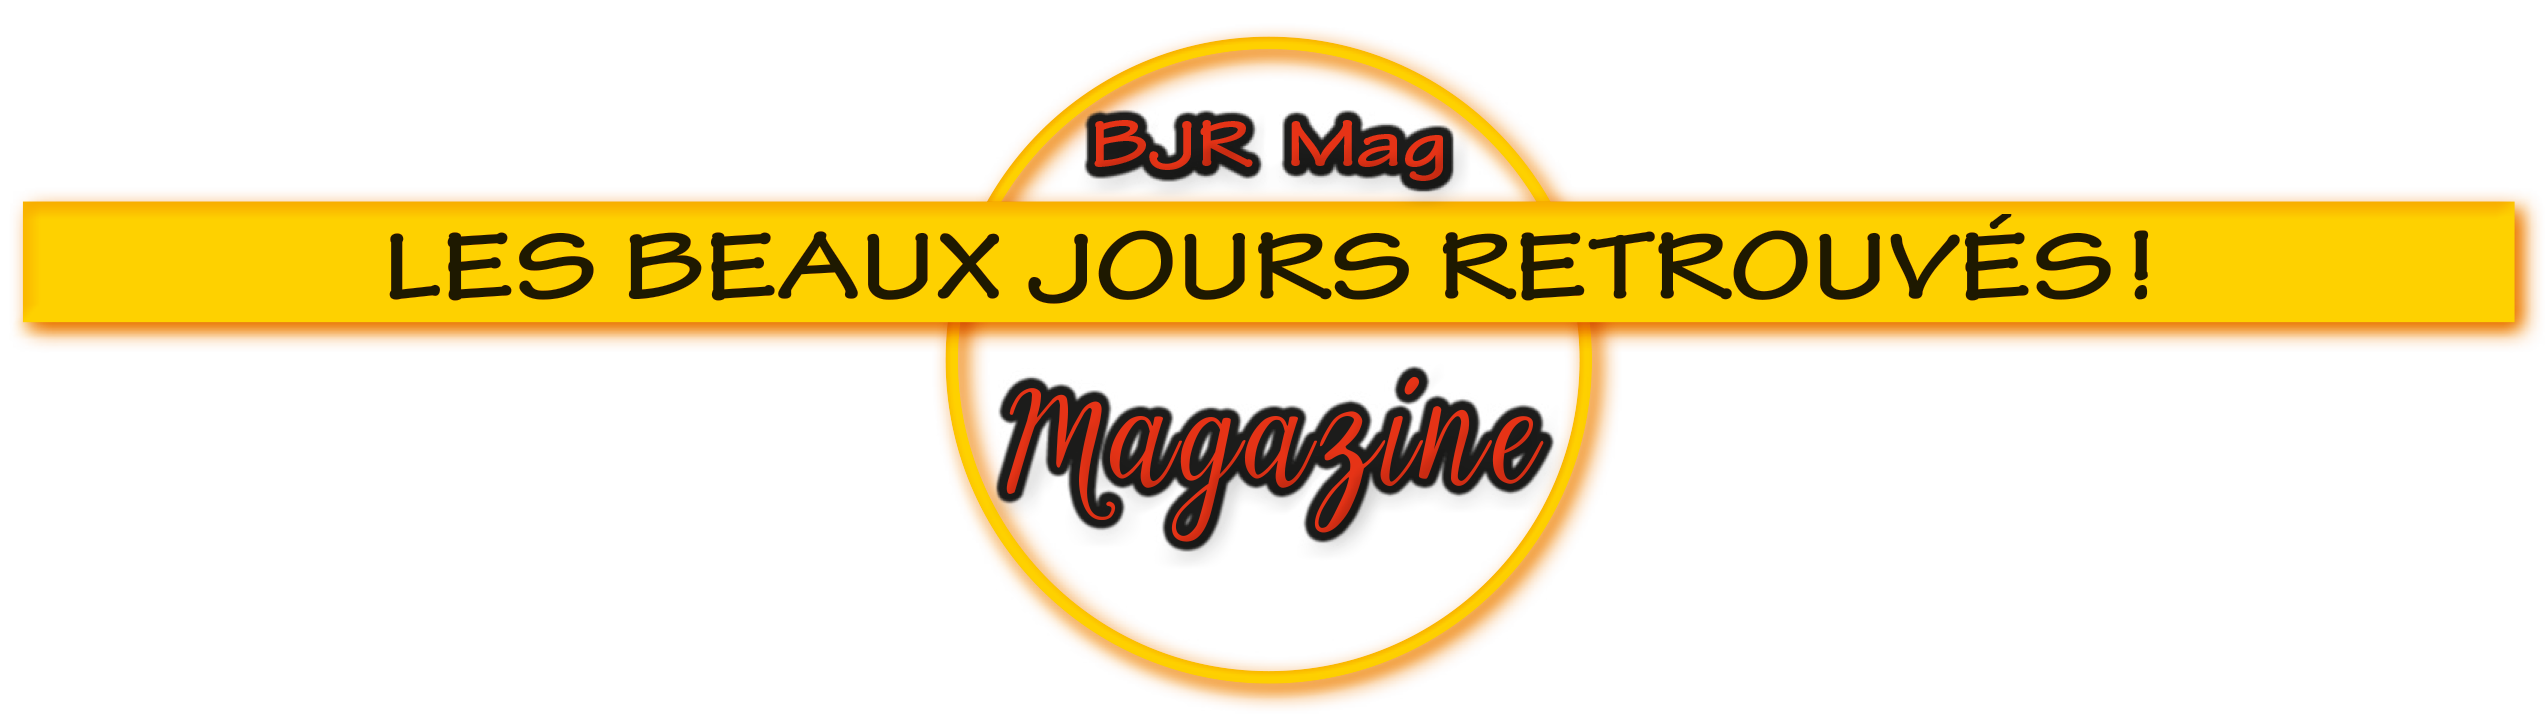 BJR Mag